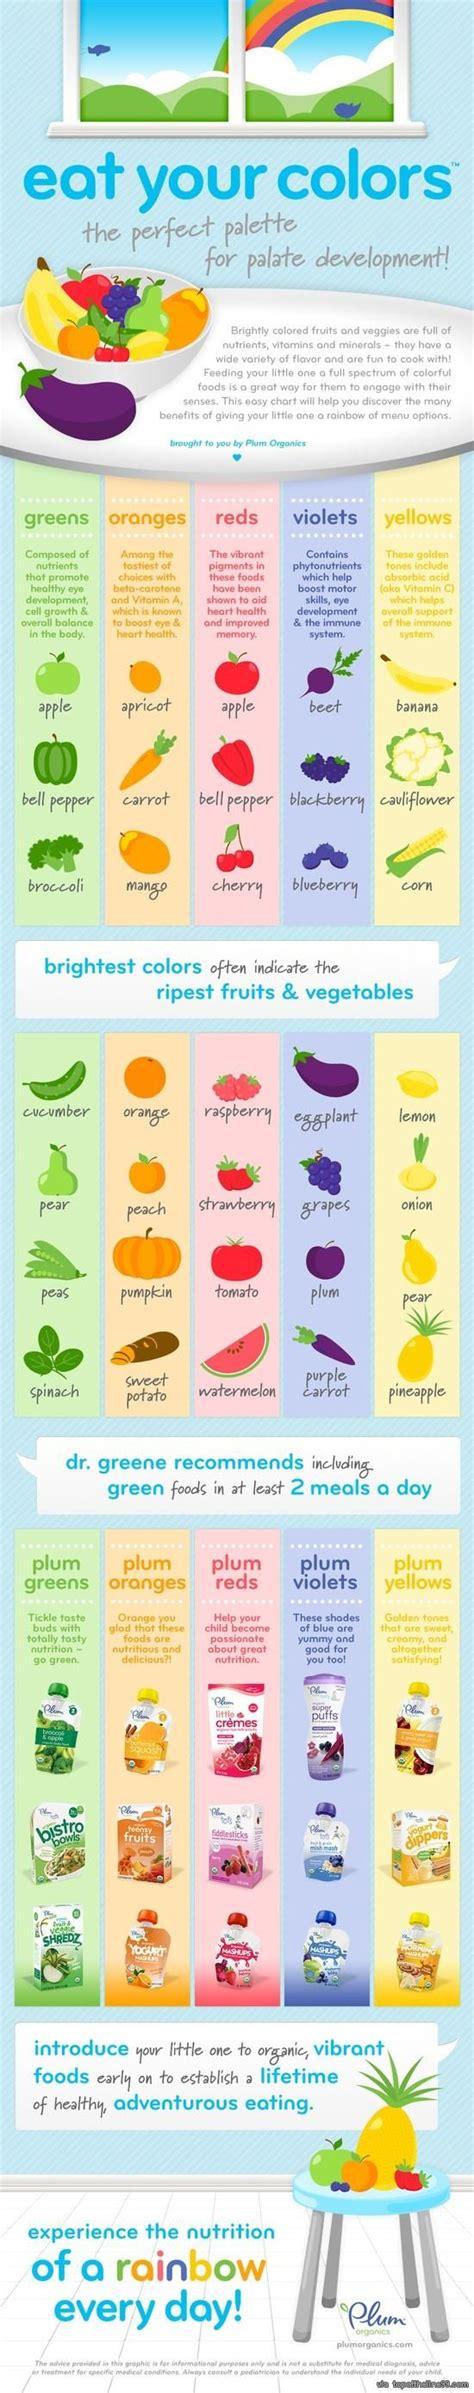 healthy colors 25 best infographic design ideas images on pinterest